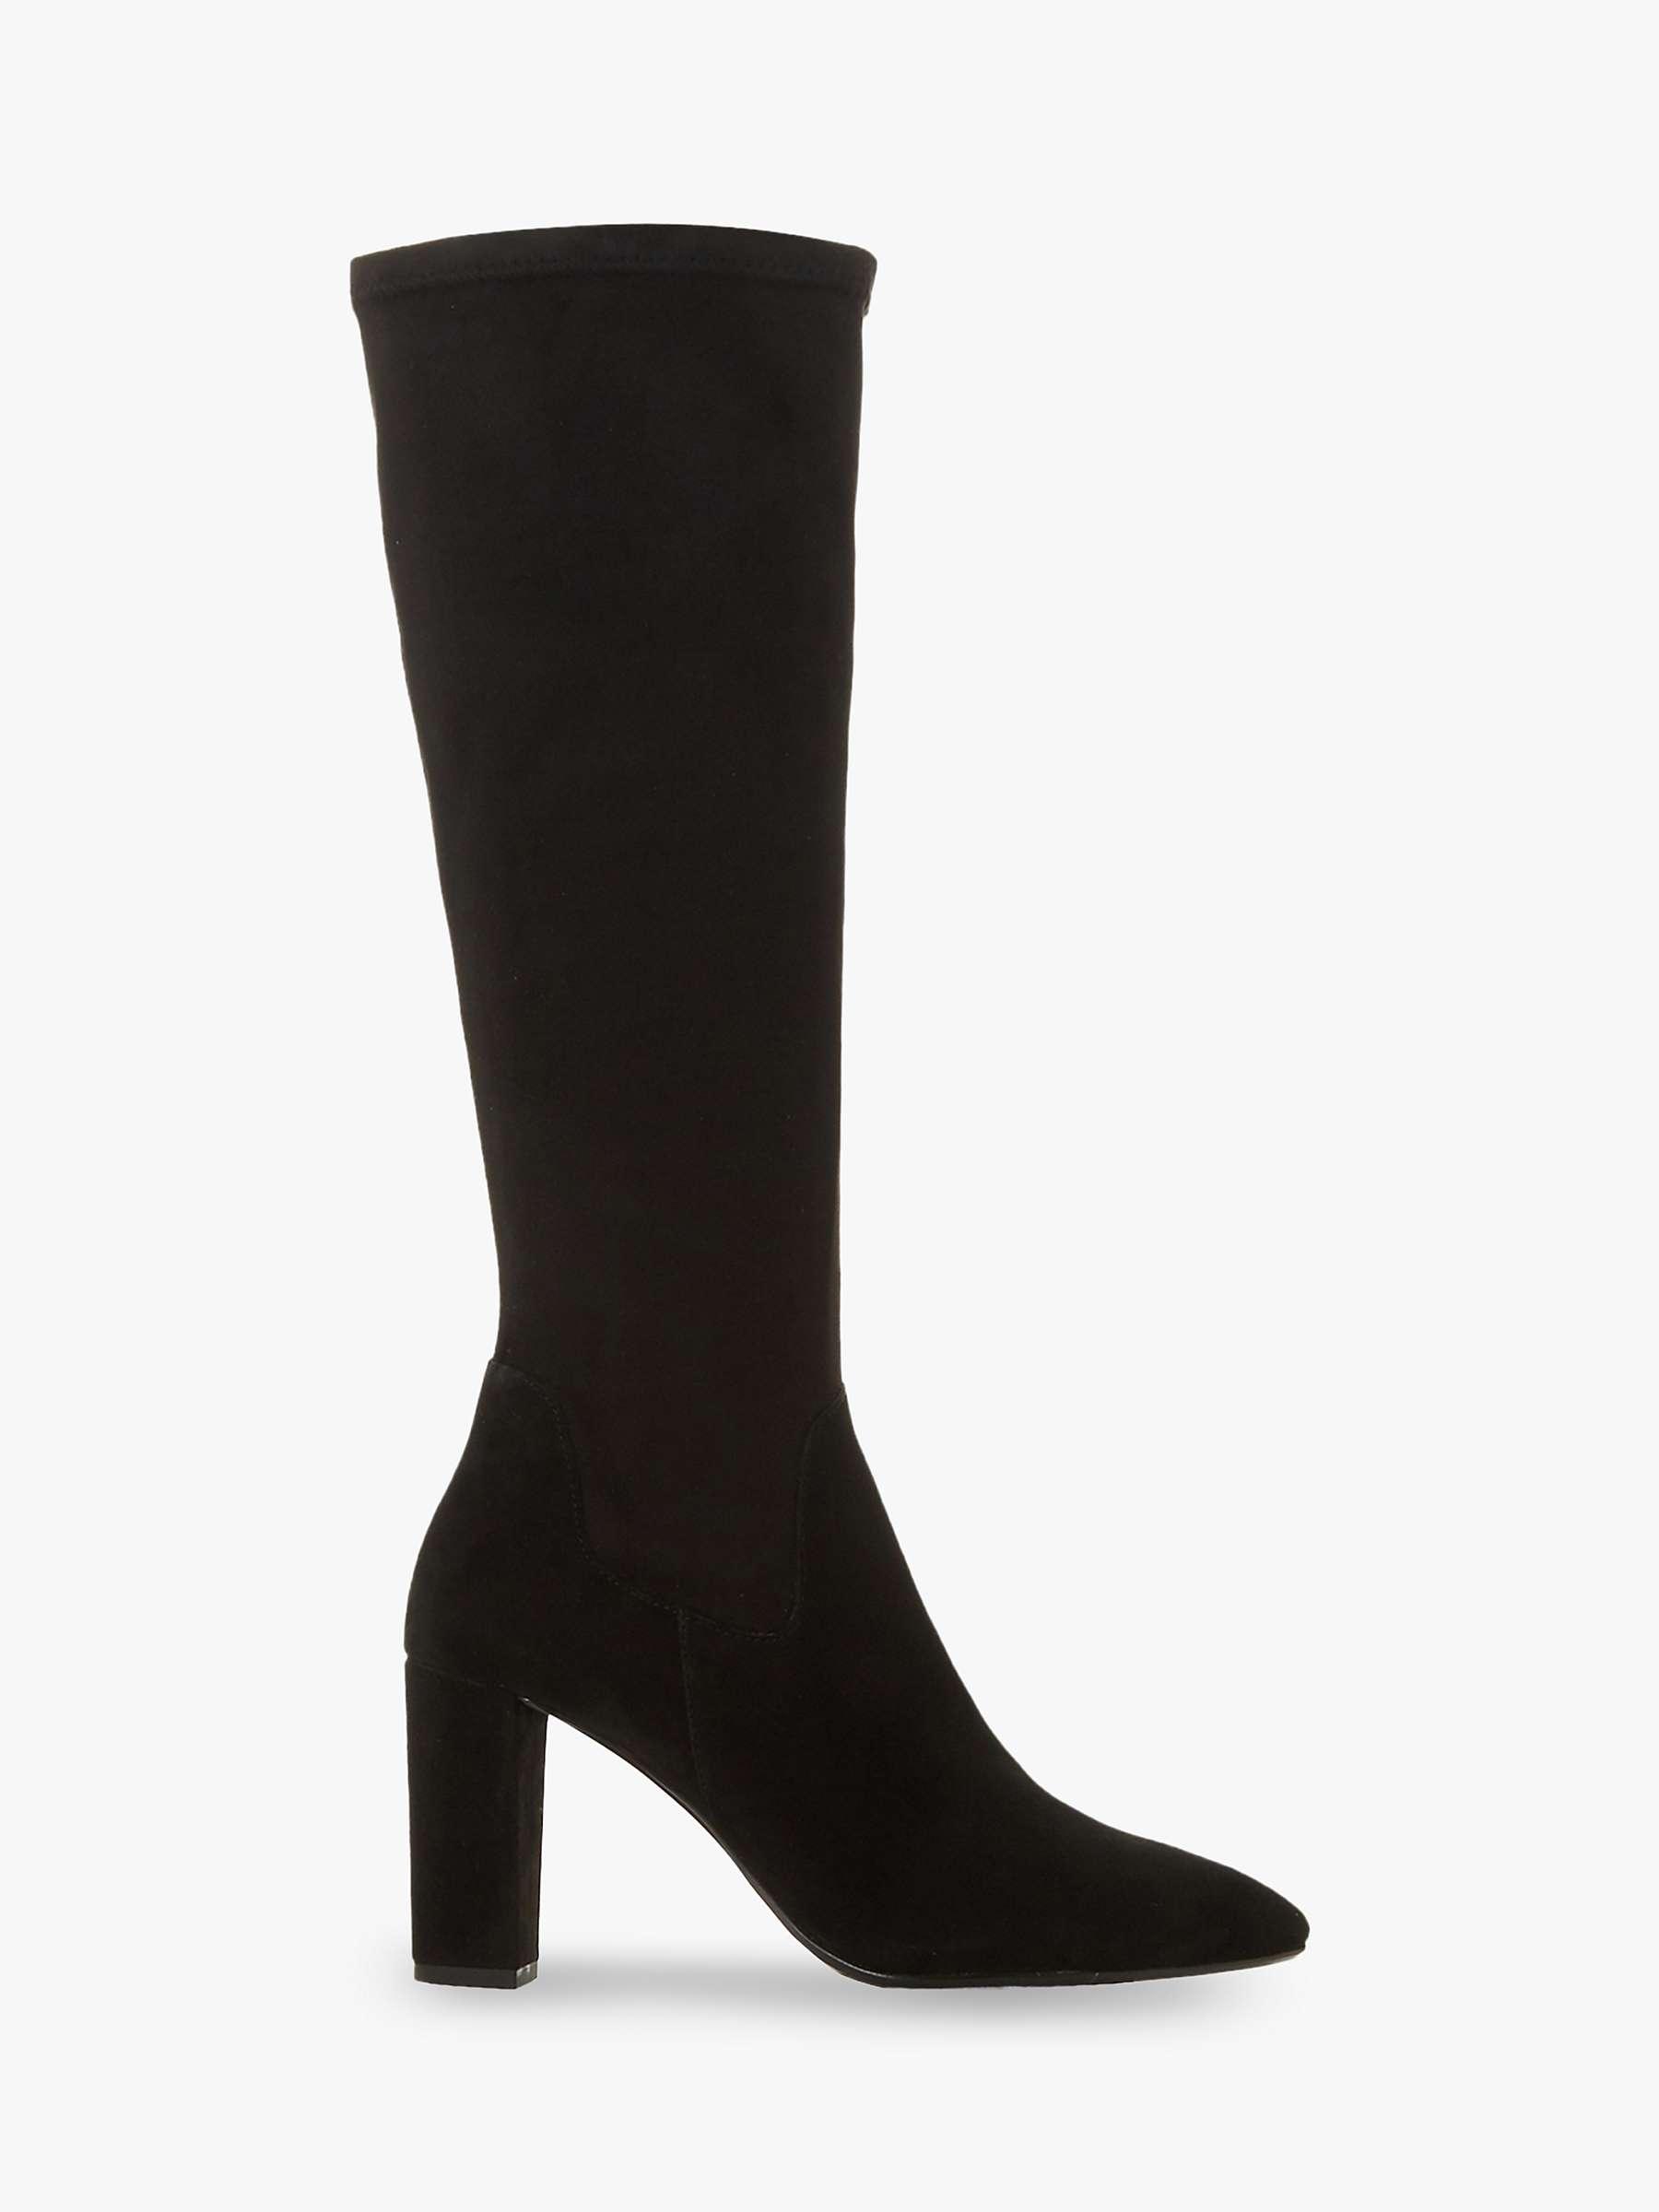 Dune Siren Stretch Block Heel Almond Toe Boots, Black by Dune